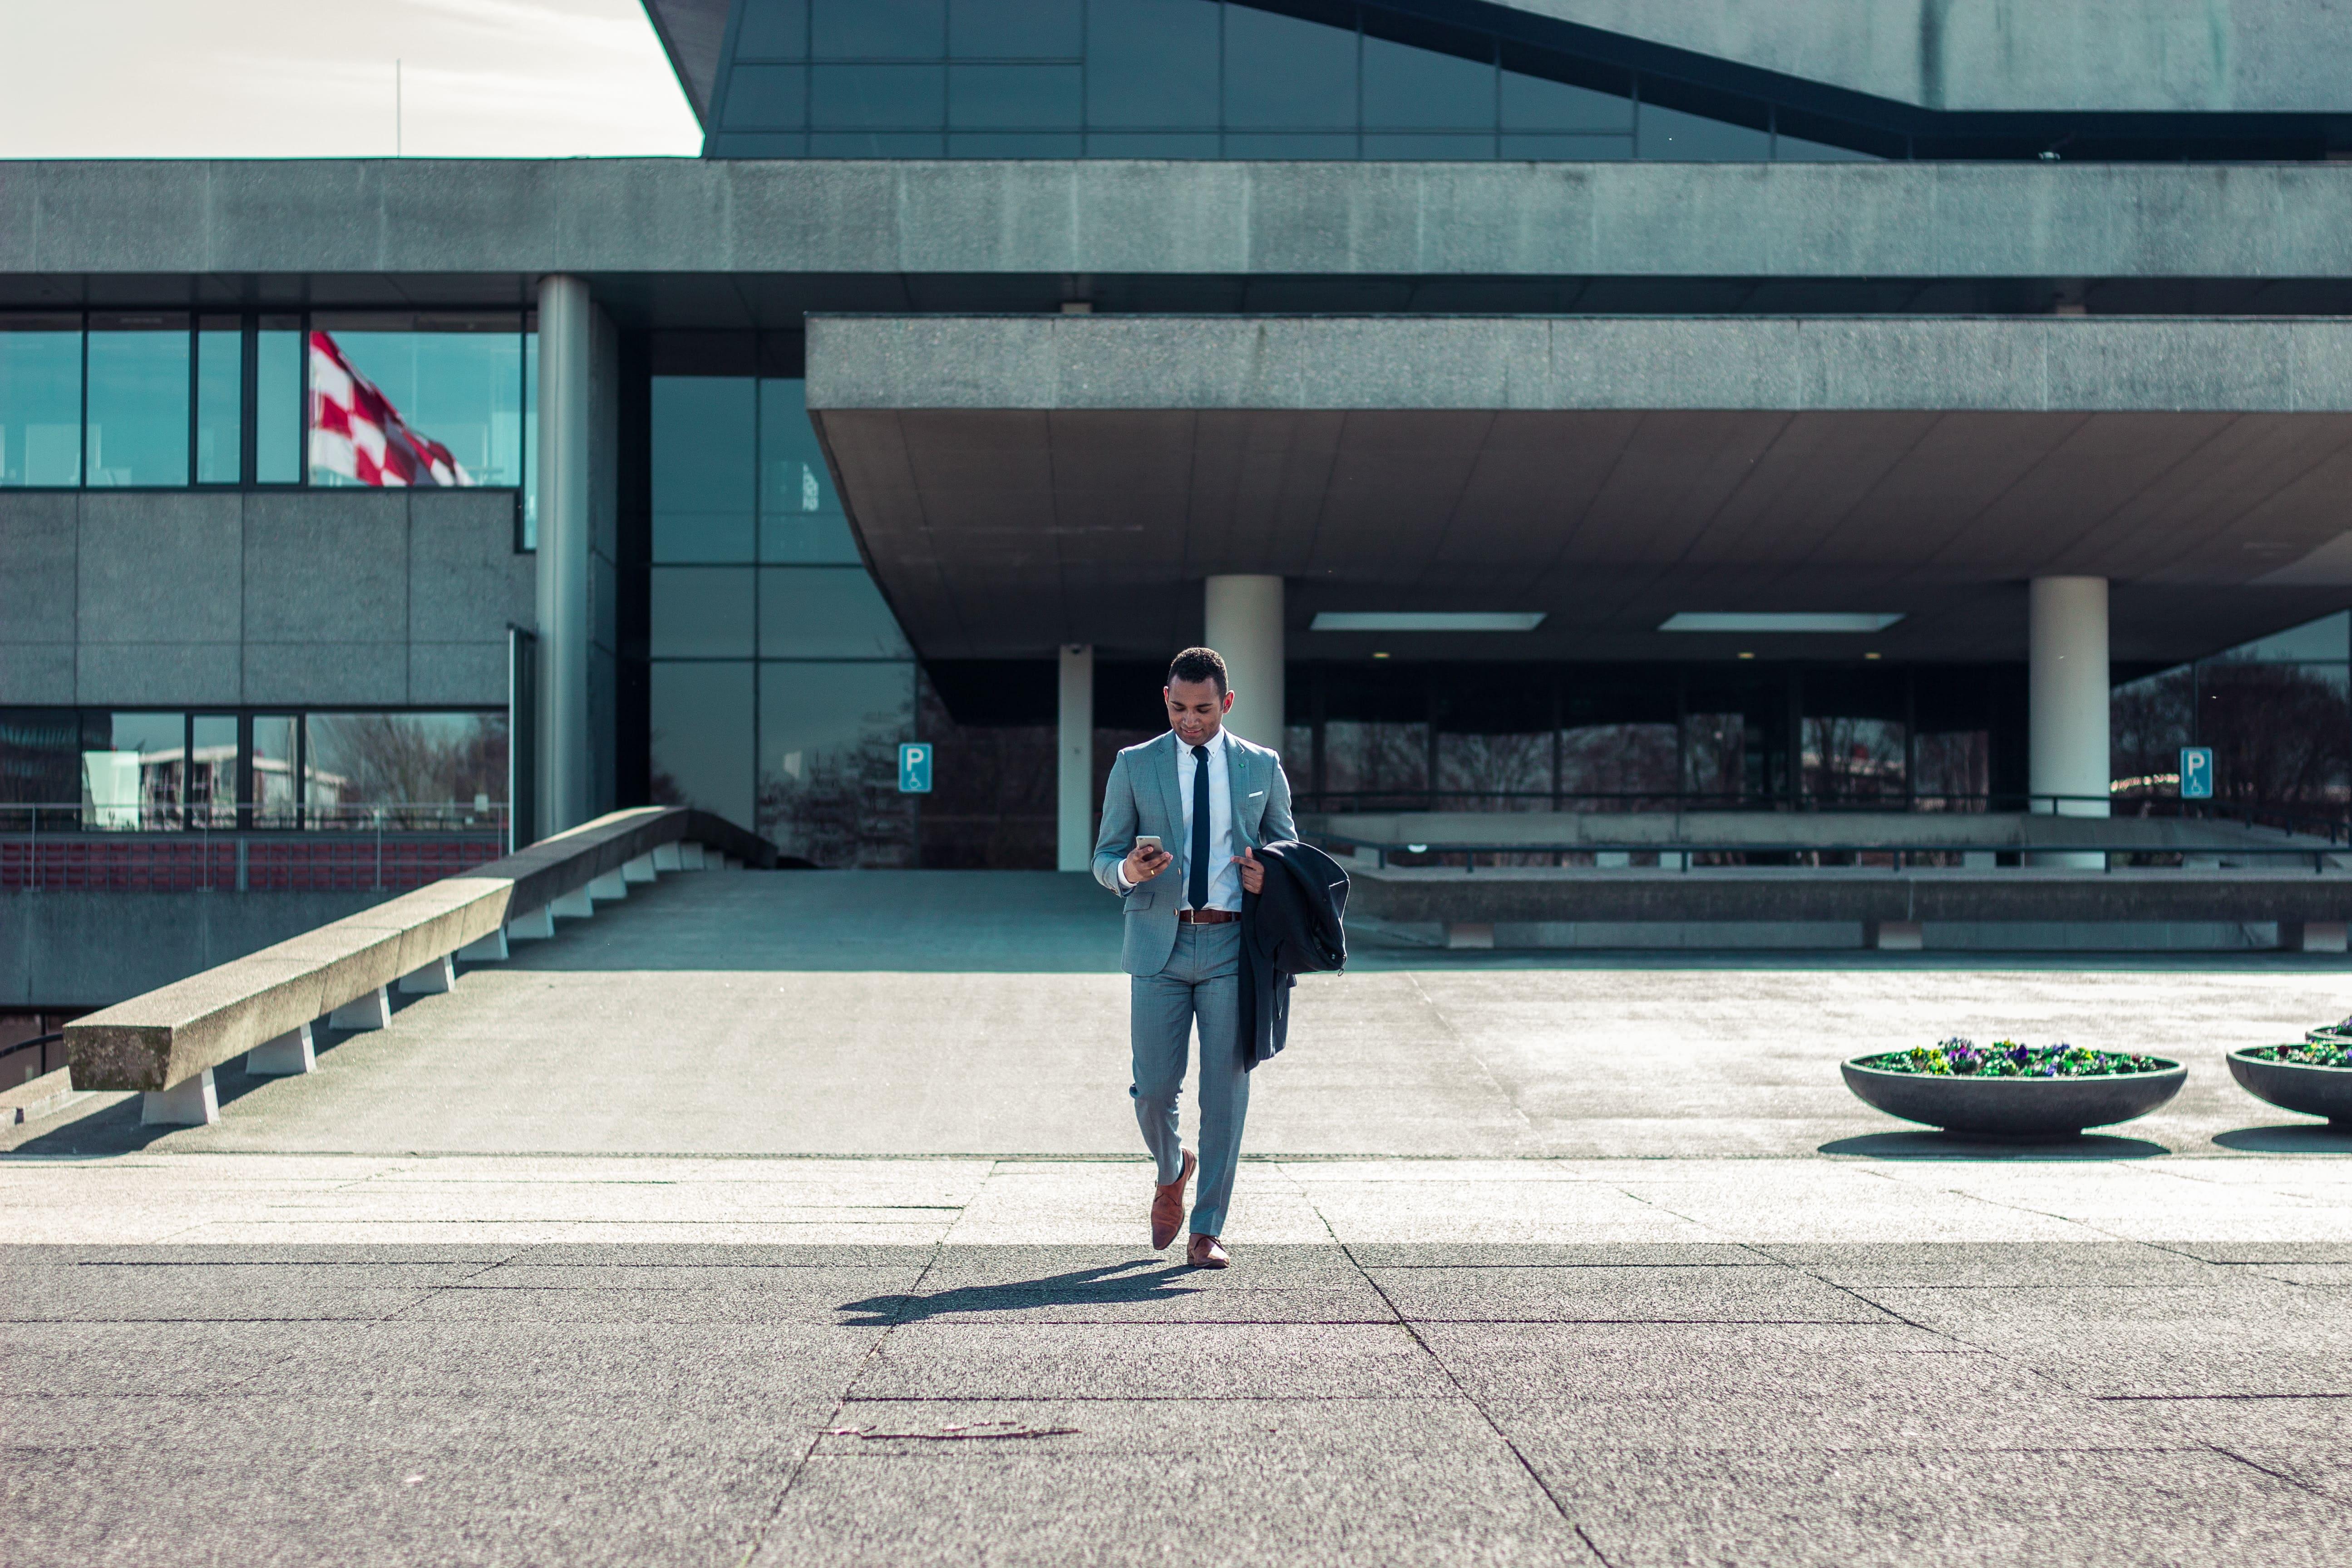 man-walking-business-suit-phone-impact-of-covid-on-broker-dealers